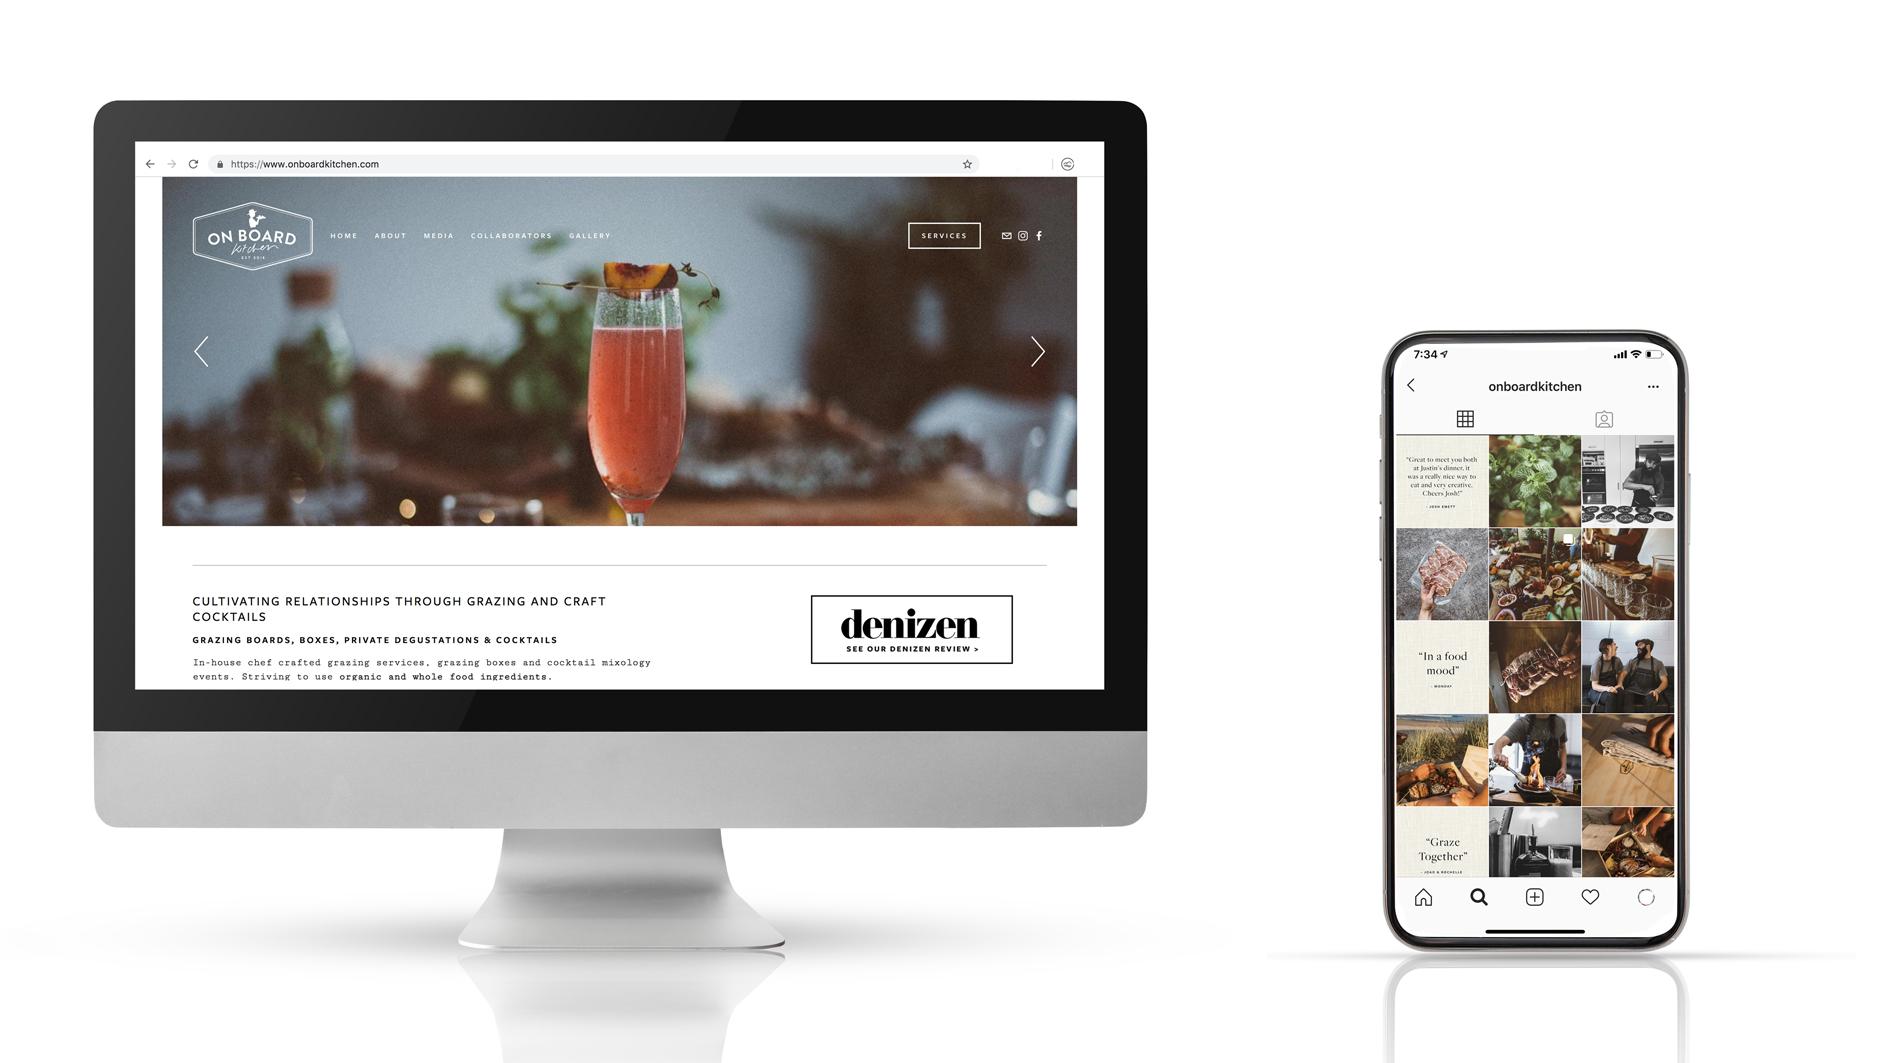 Onboard-Kitchen-Website-Lola-Photography.jpg